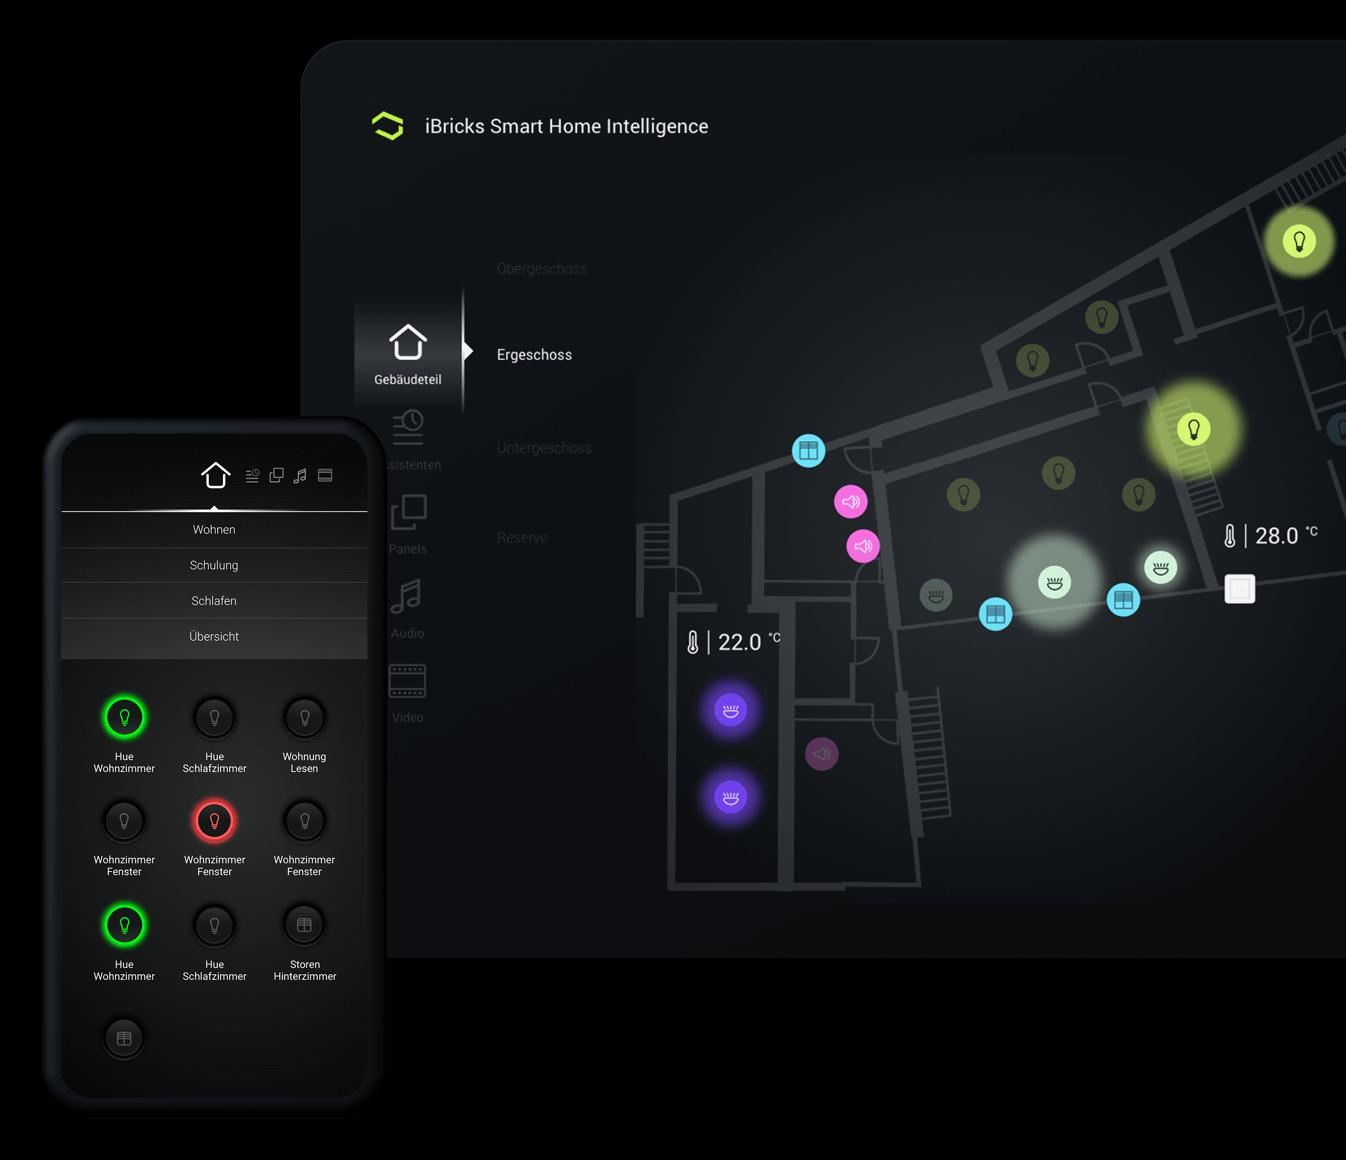 ibricks-website-app-gui-cut-mirrored-2x